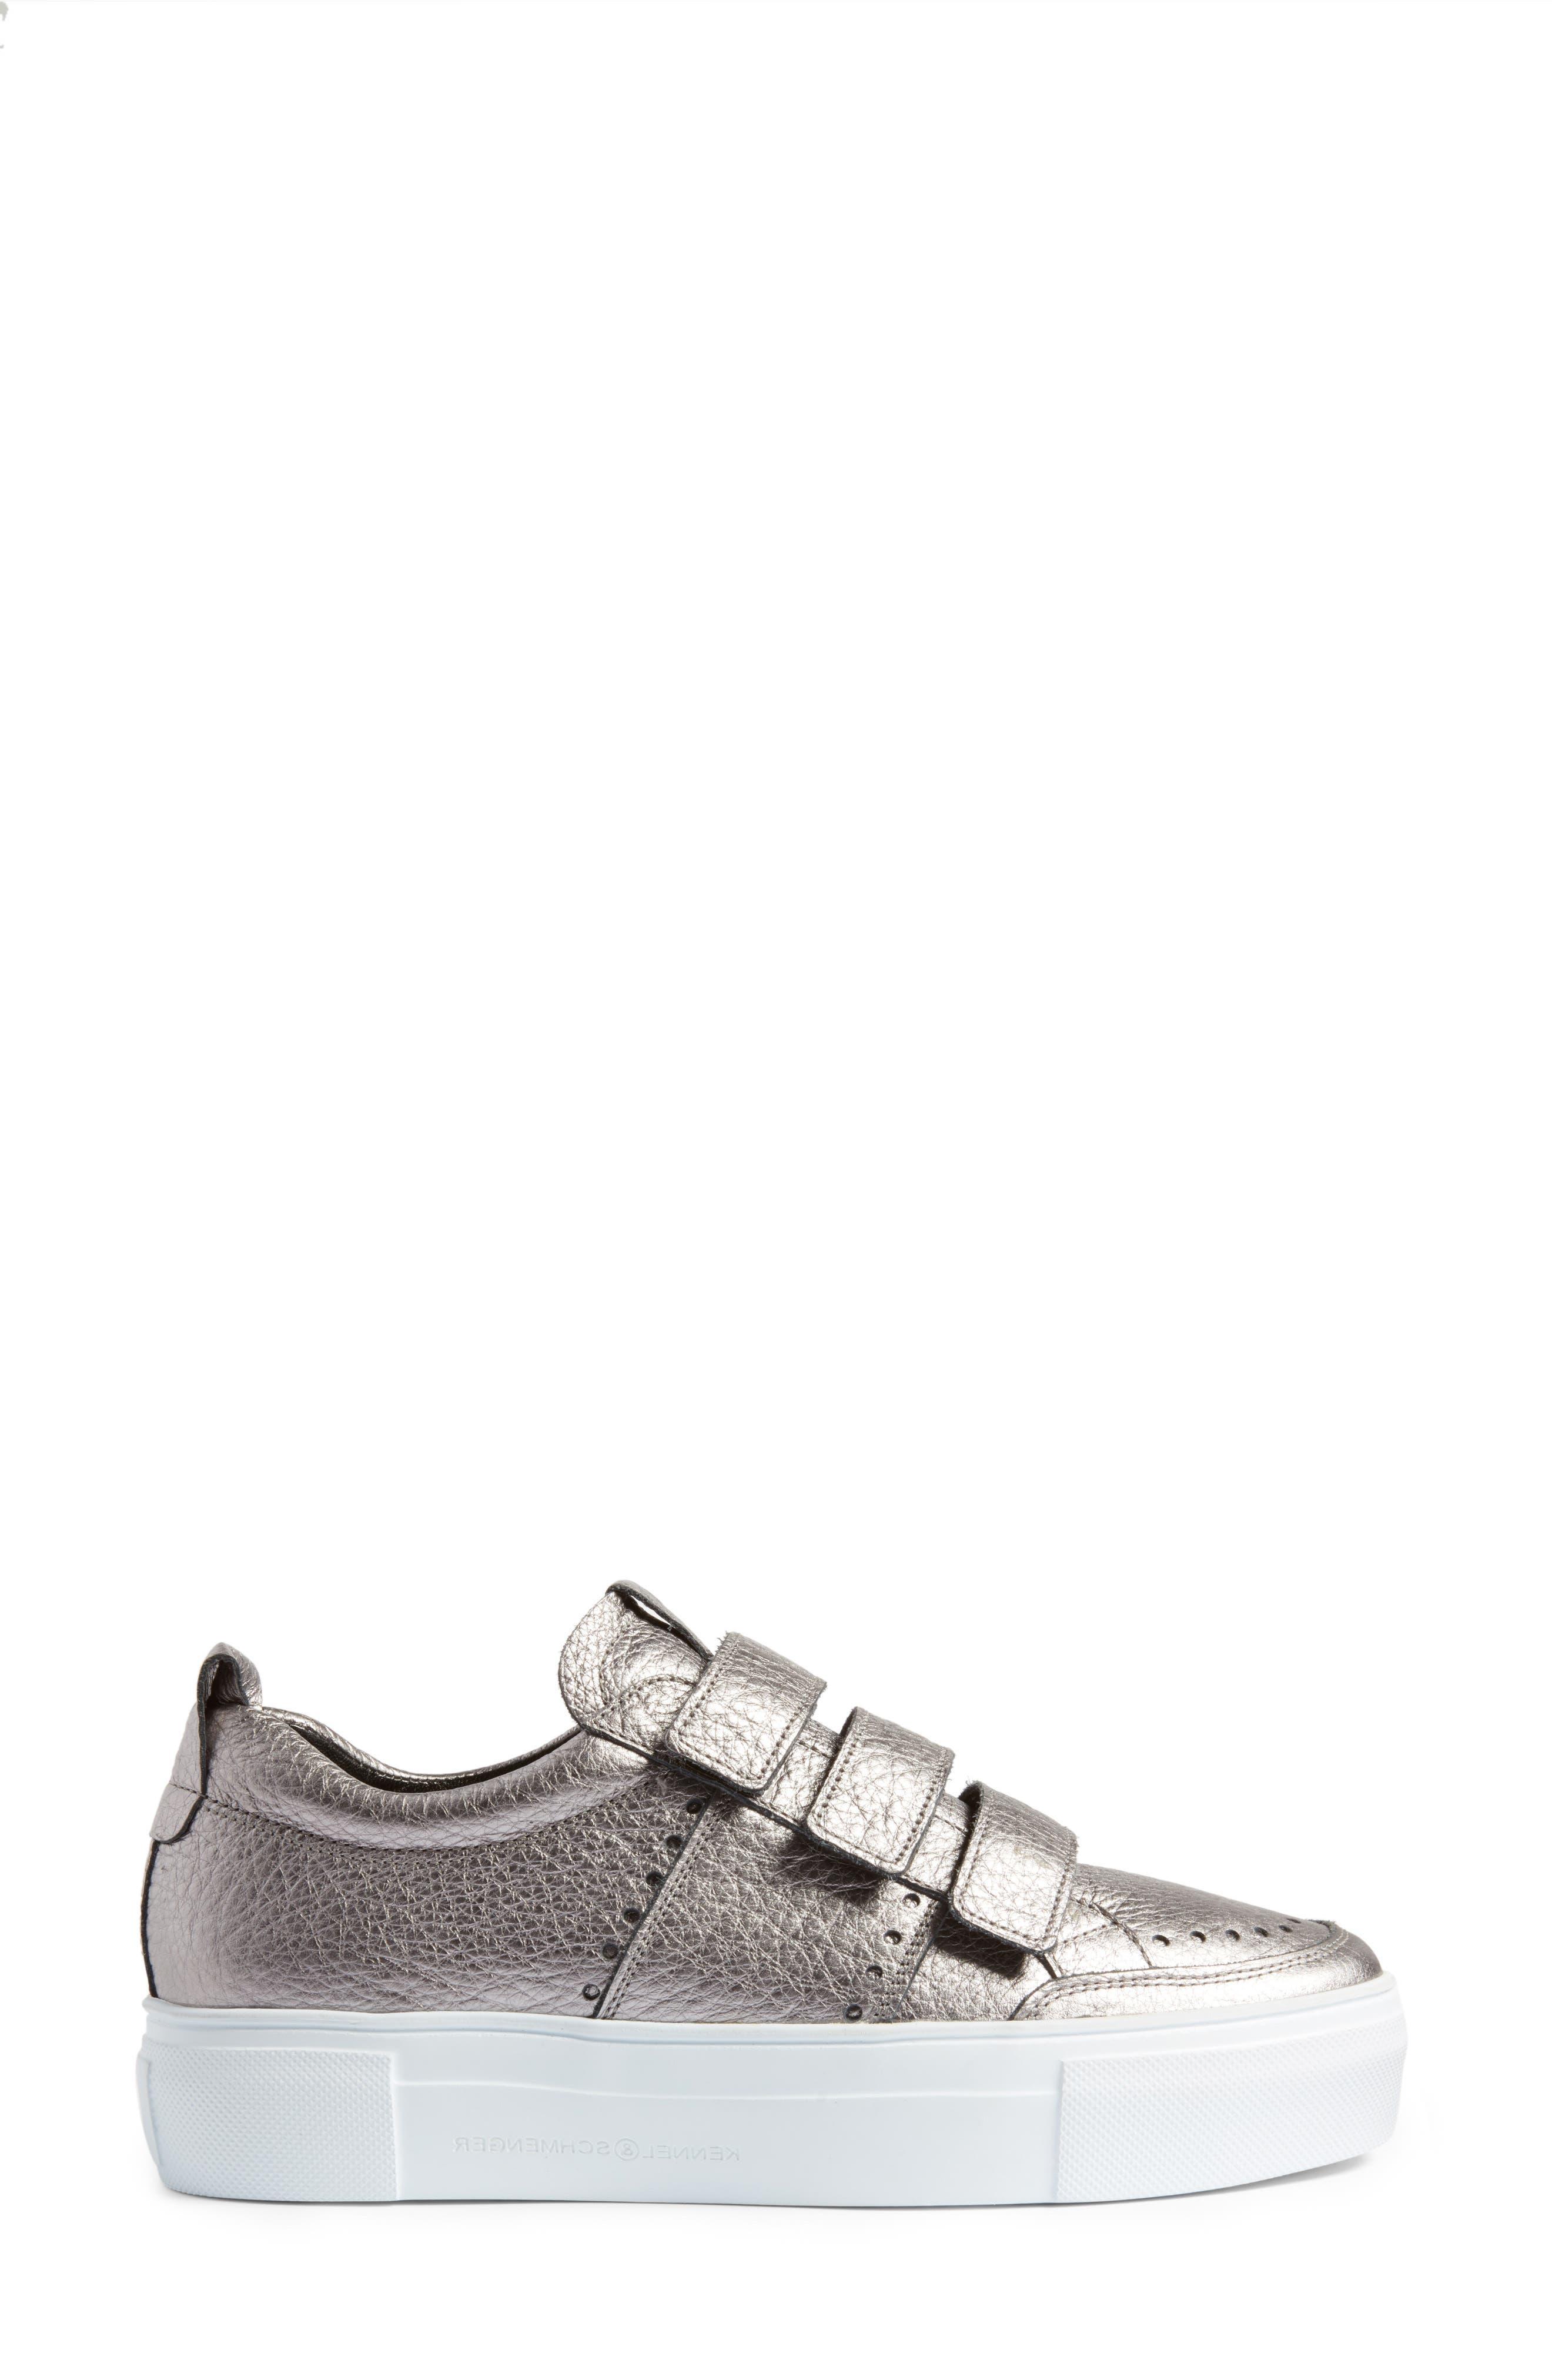 Kennel & Schmenger Big Low Top Tab Sneaker,                             Alternate thumbnail 3, color,                             020